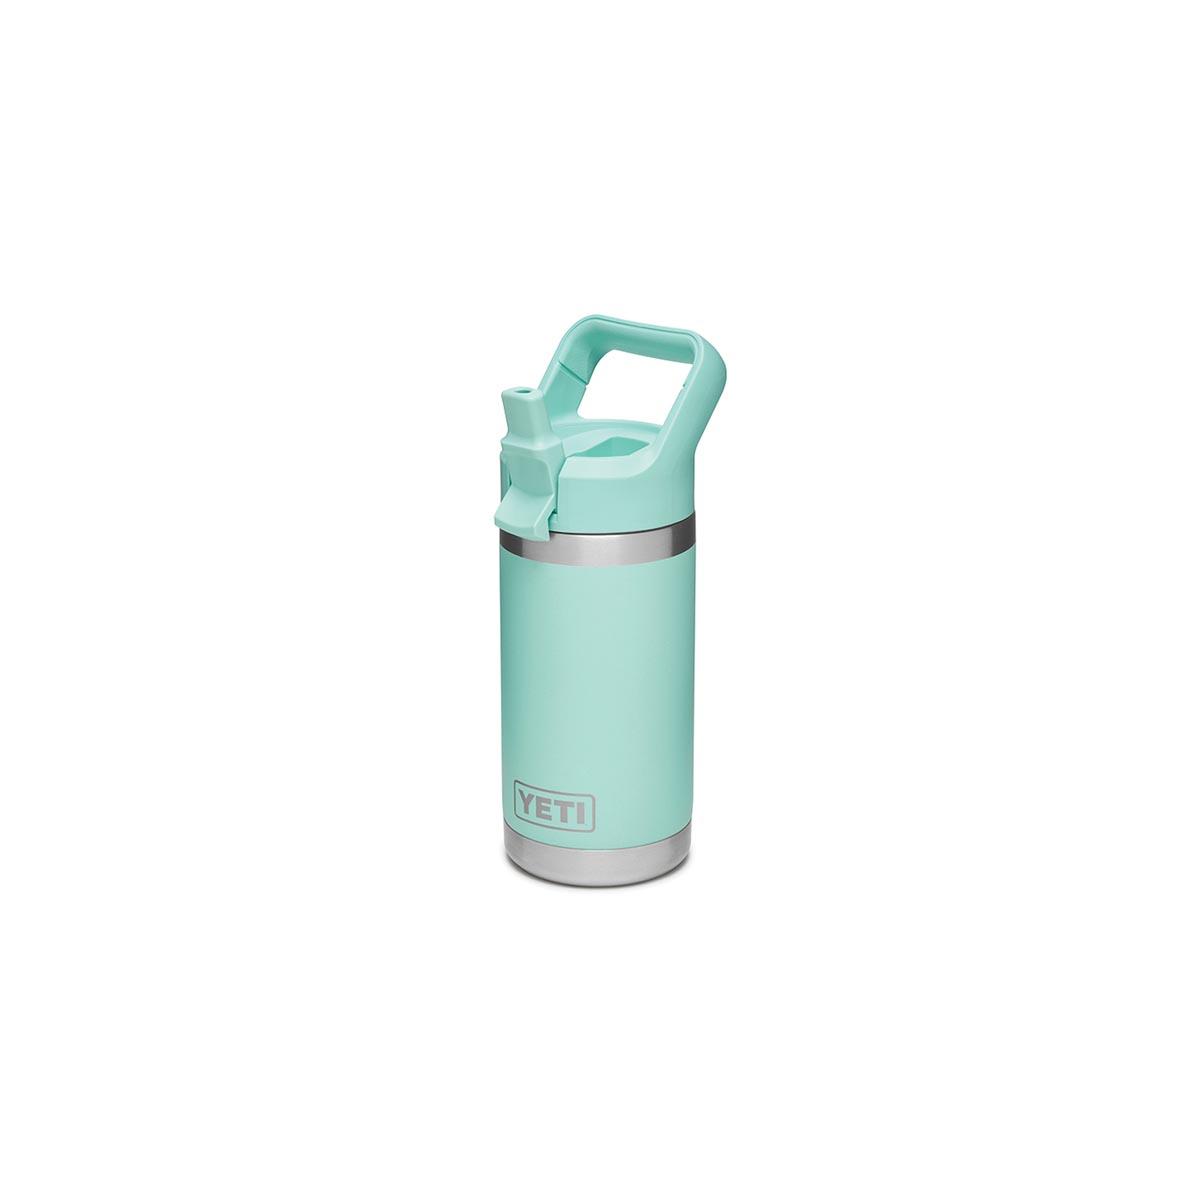 Picture of YETI Rambler Jr 21071500020 Kid's Bottle, 12 oz Capacity, Stainless Steel, Seafoam